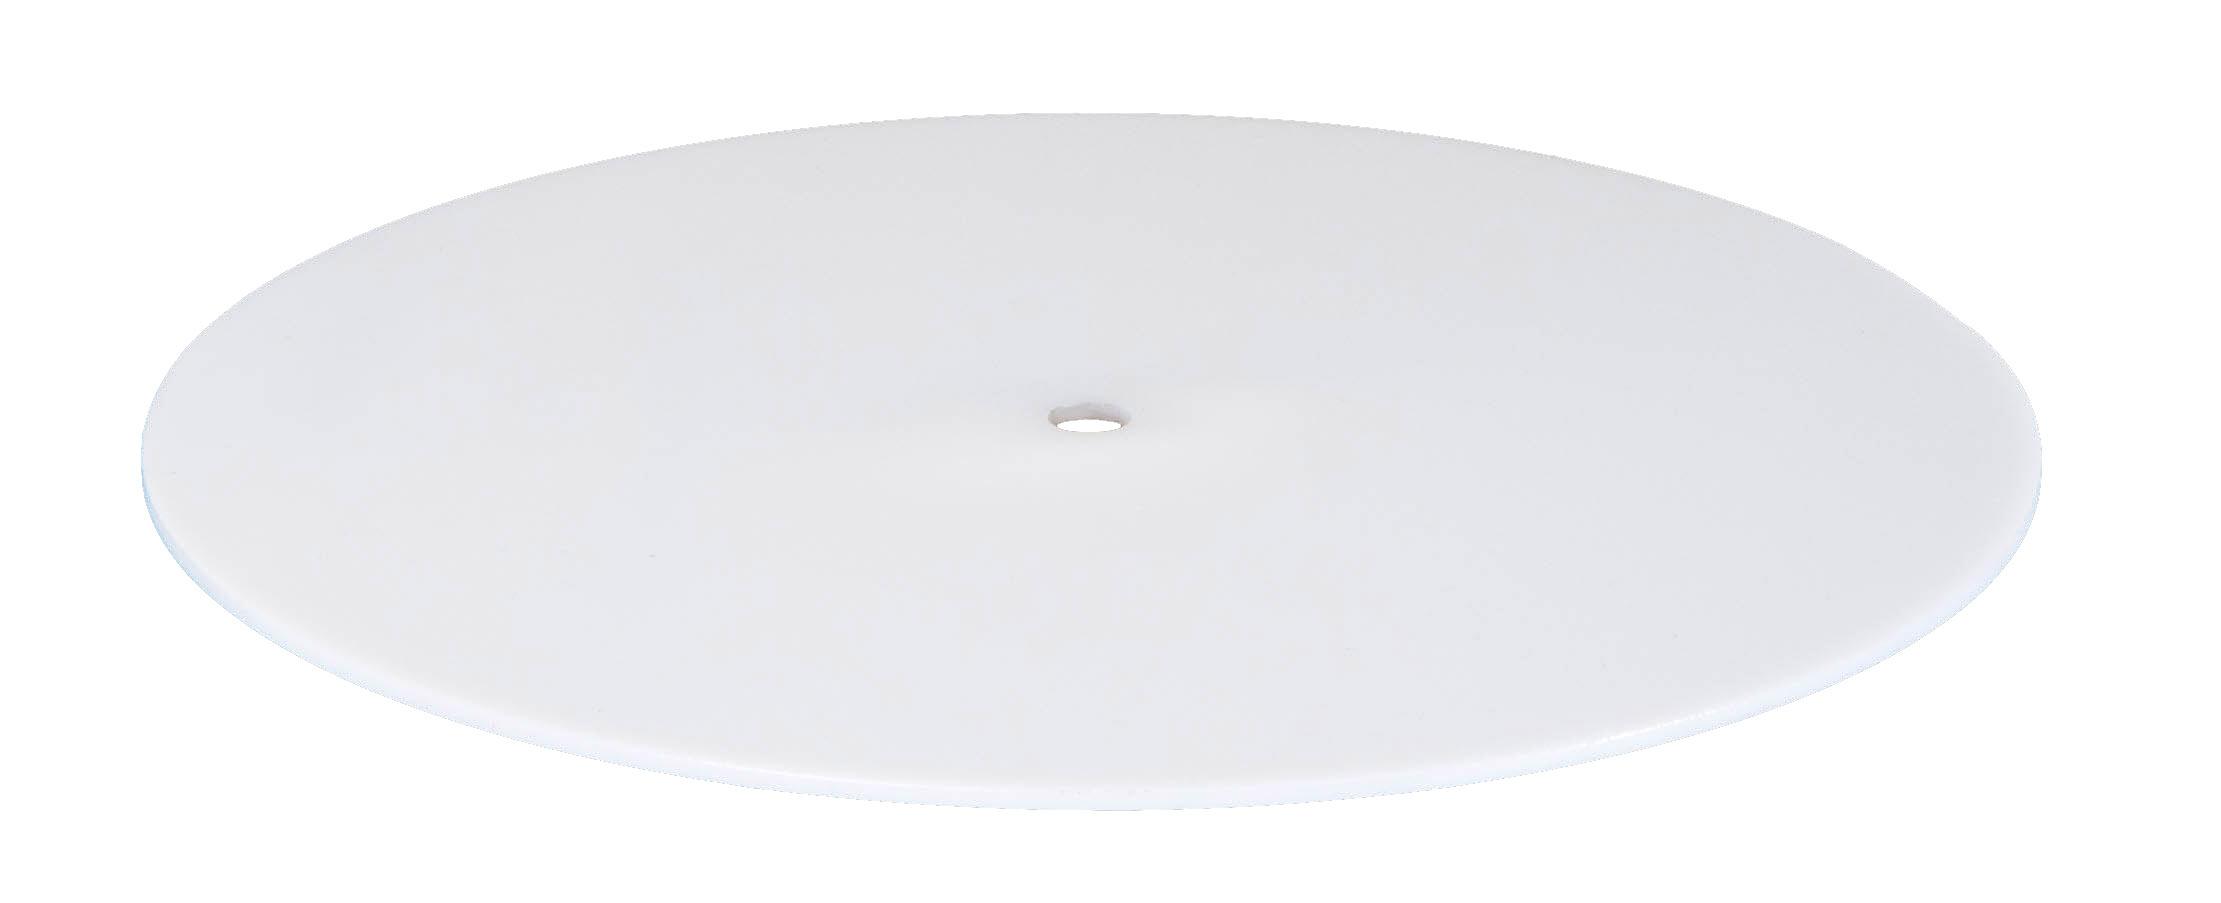 Fabric Lampshade Diffuser 08339 B Amp P Lamp Supply